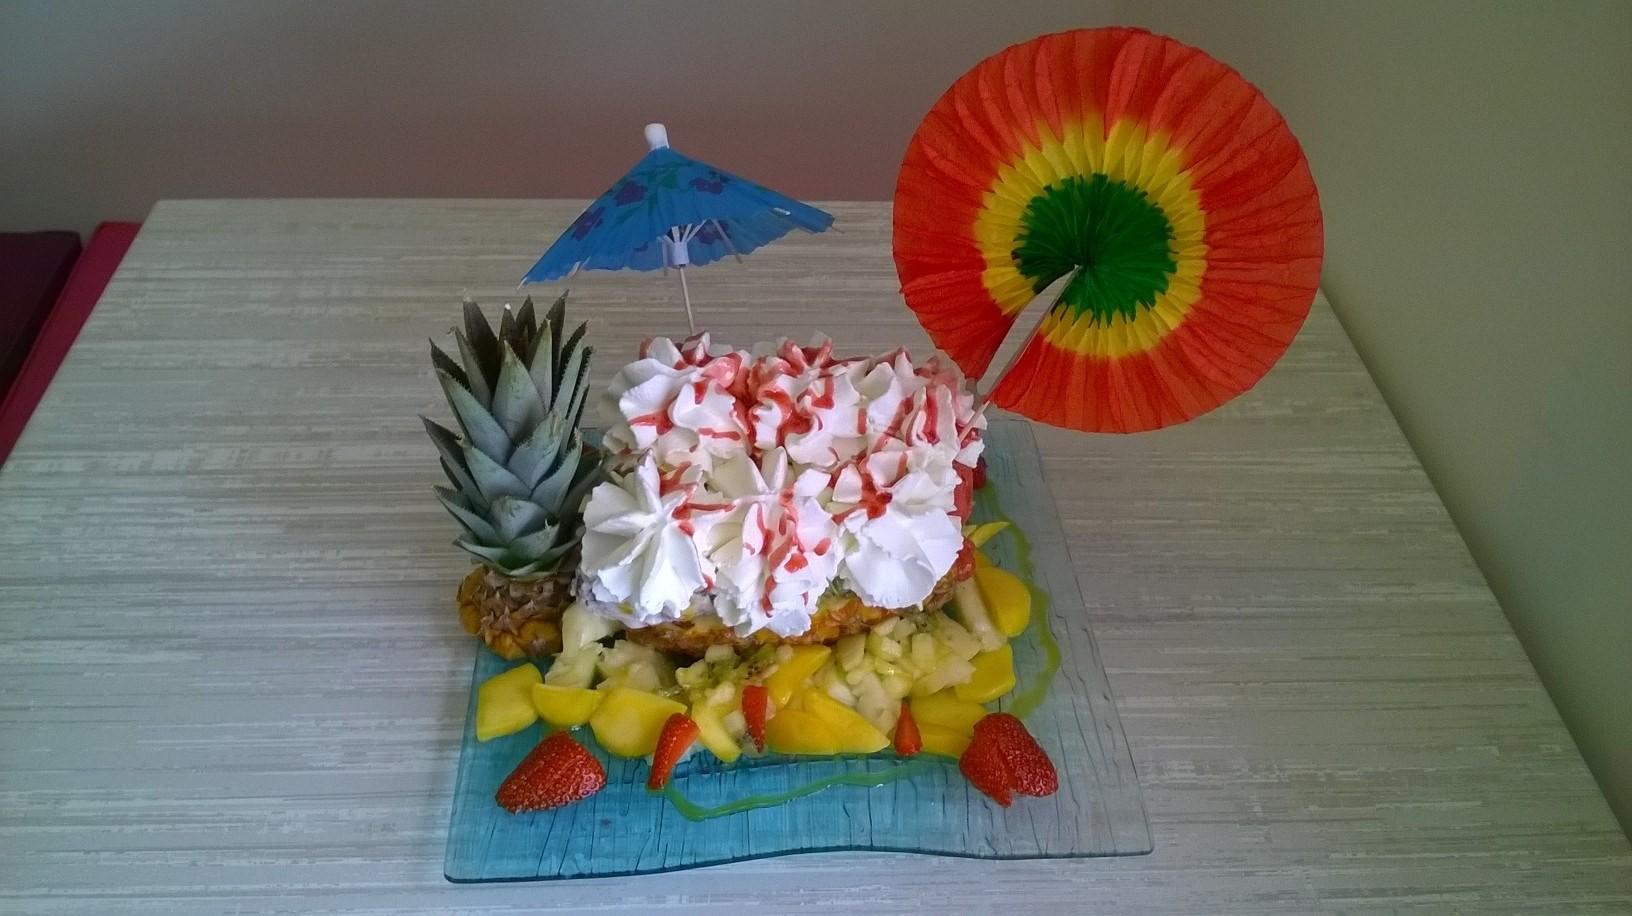 Coupe glace meze balaruc bouzigues thau 34